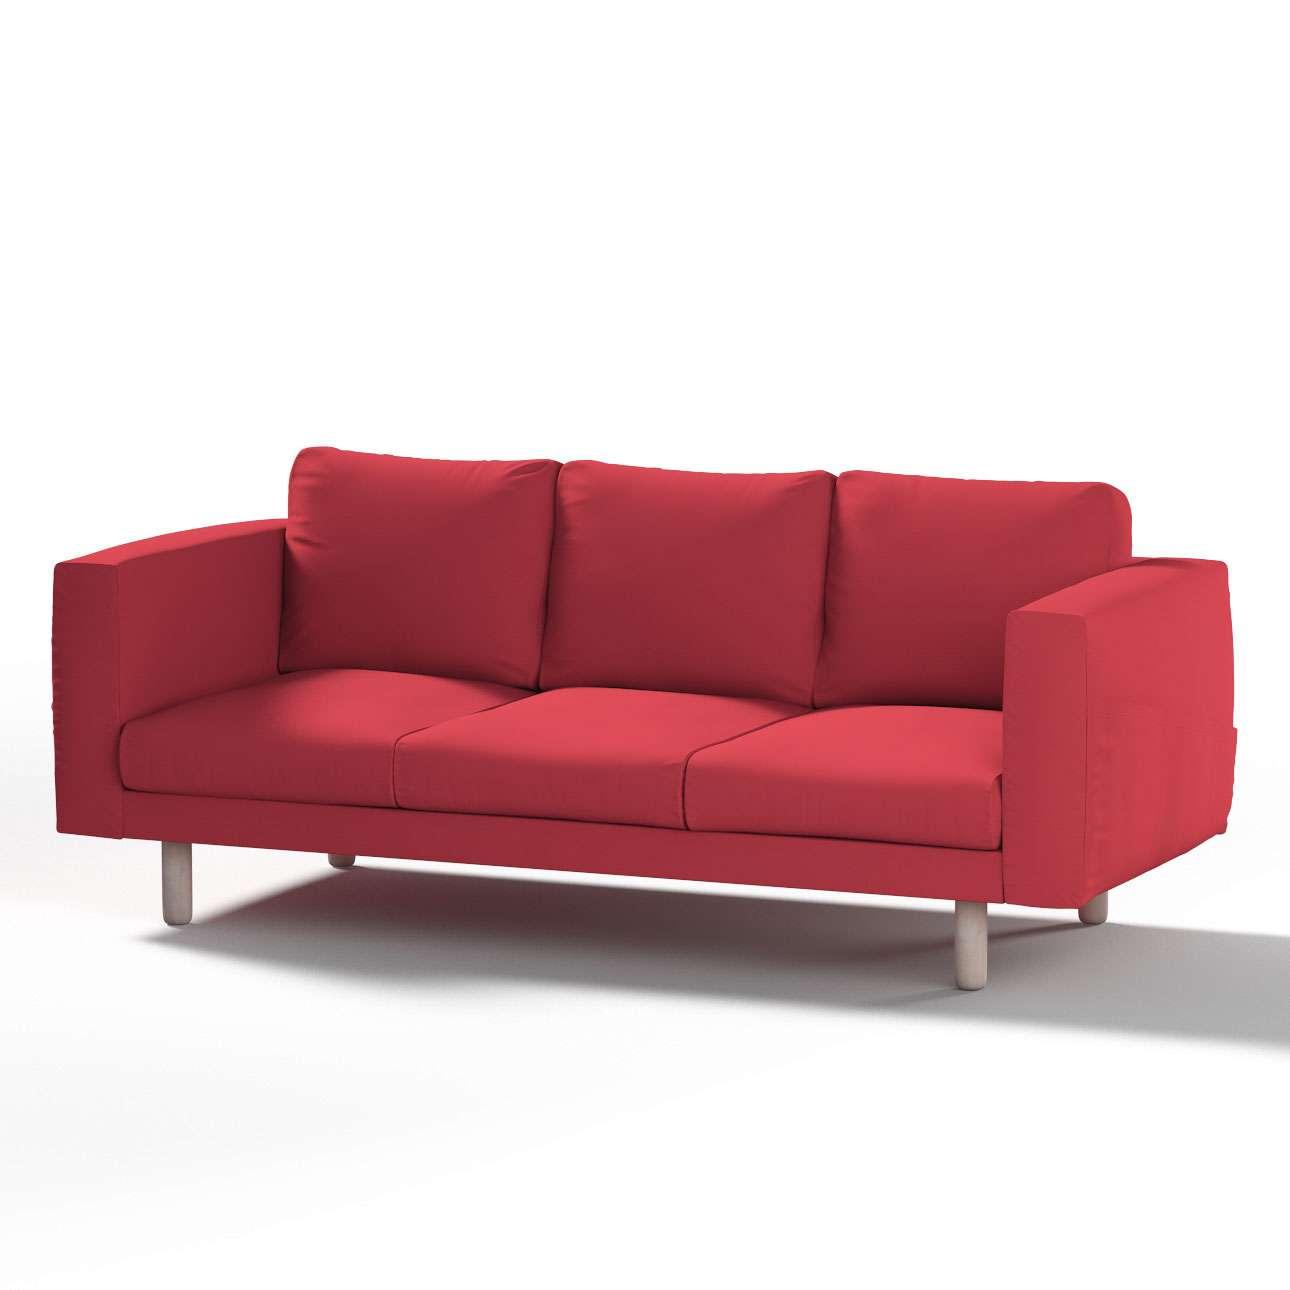 norsborg 3 sitzer sofabezug rot dekoria. Black Bedroom Furniture Sets. Home Design Ideas